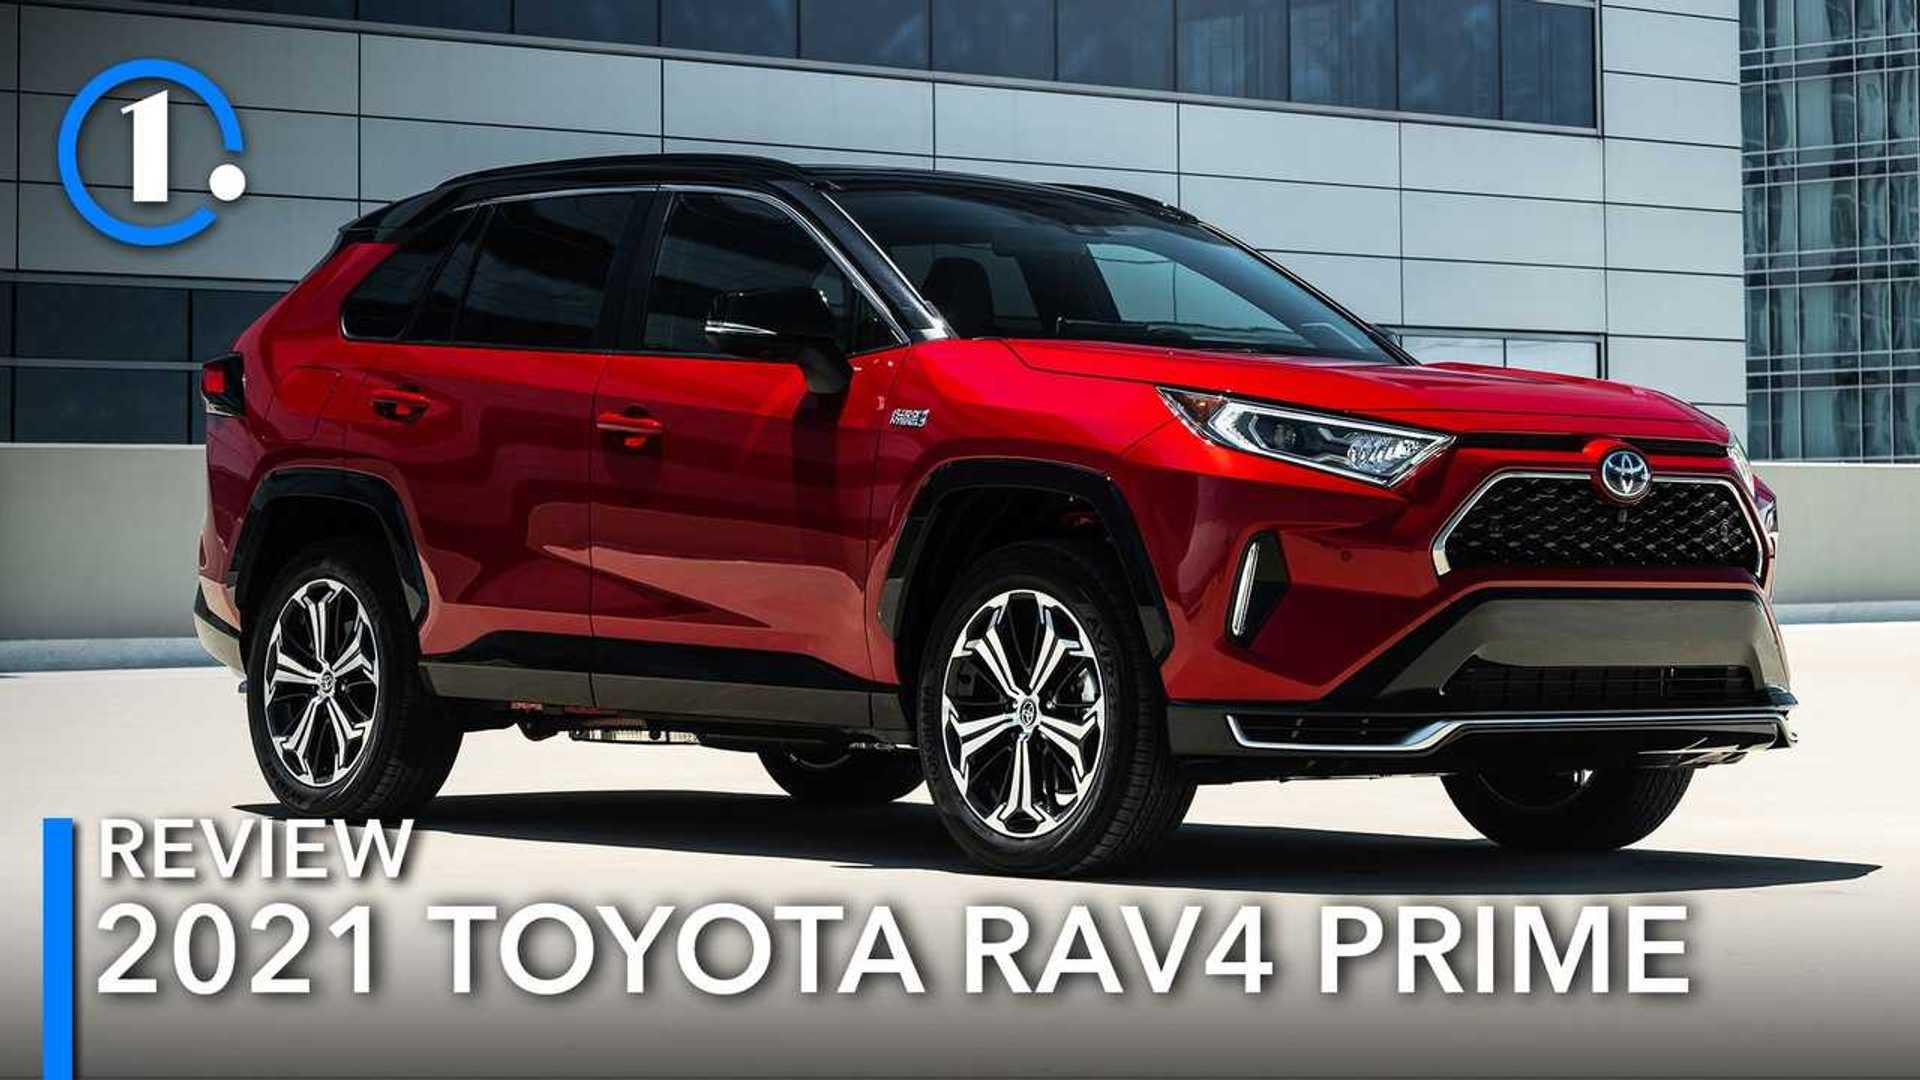 2021 Toyota RAV4 Prime Review: No Reason Not To